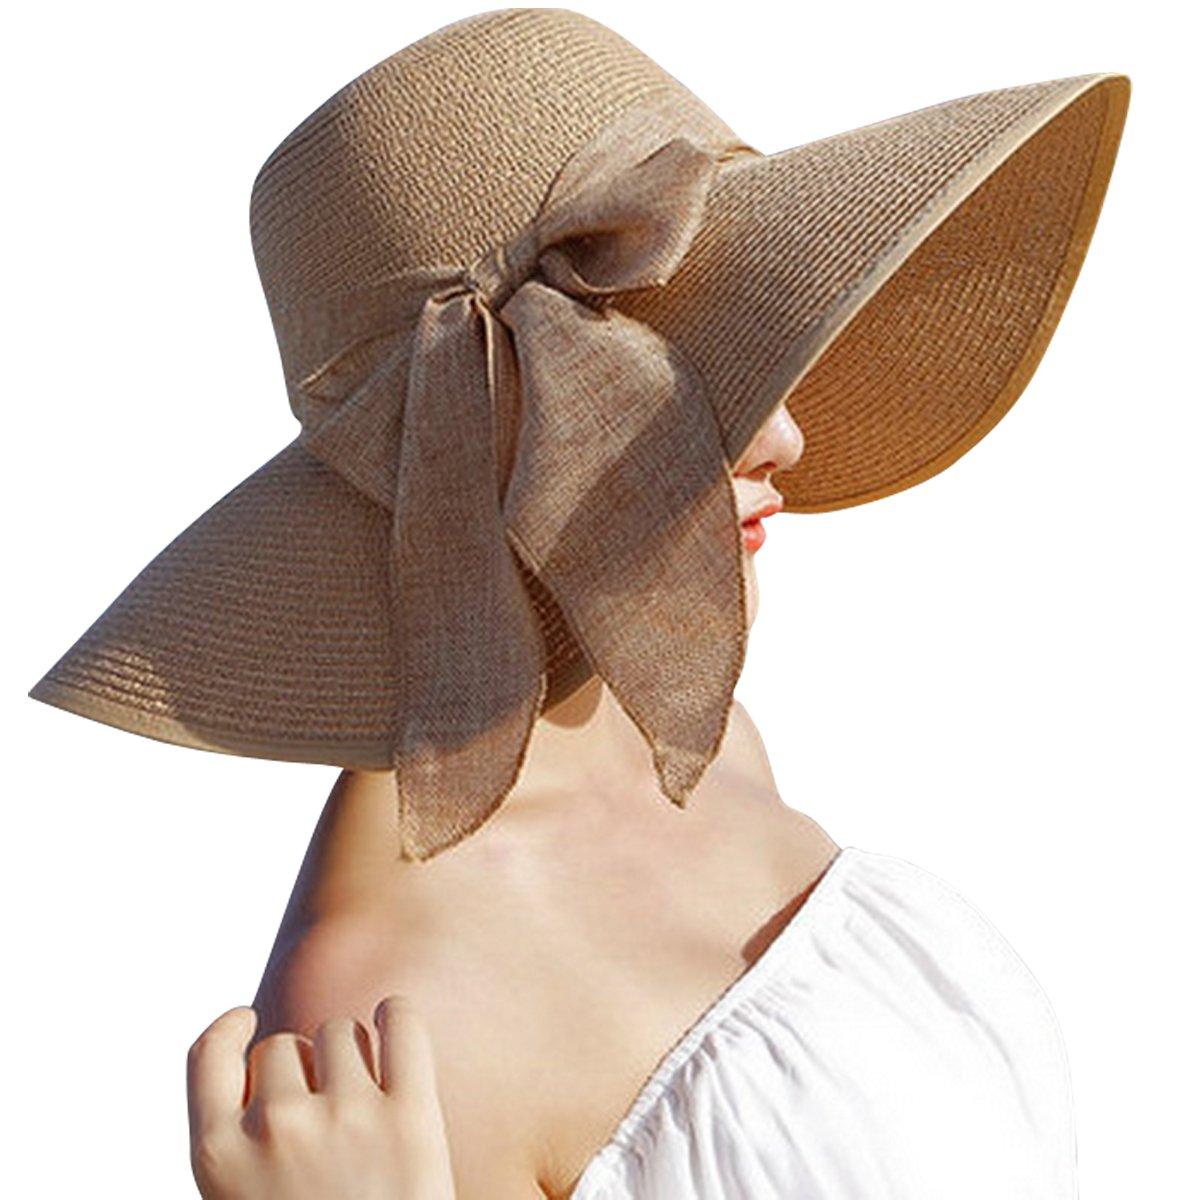 JOYEBUY Women Lady Big Bowknot Straw Hat Floppy Foldable Roll up UV Protection Beach Cap Sun Hat (Khaki) by JOYEBUY